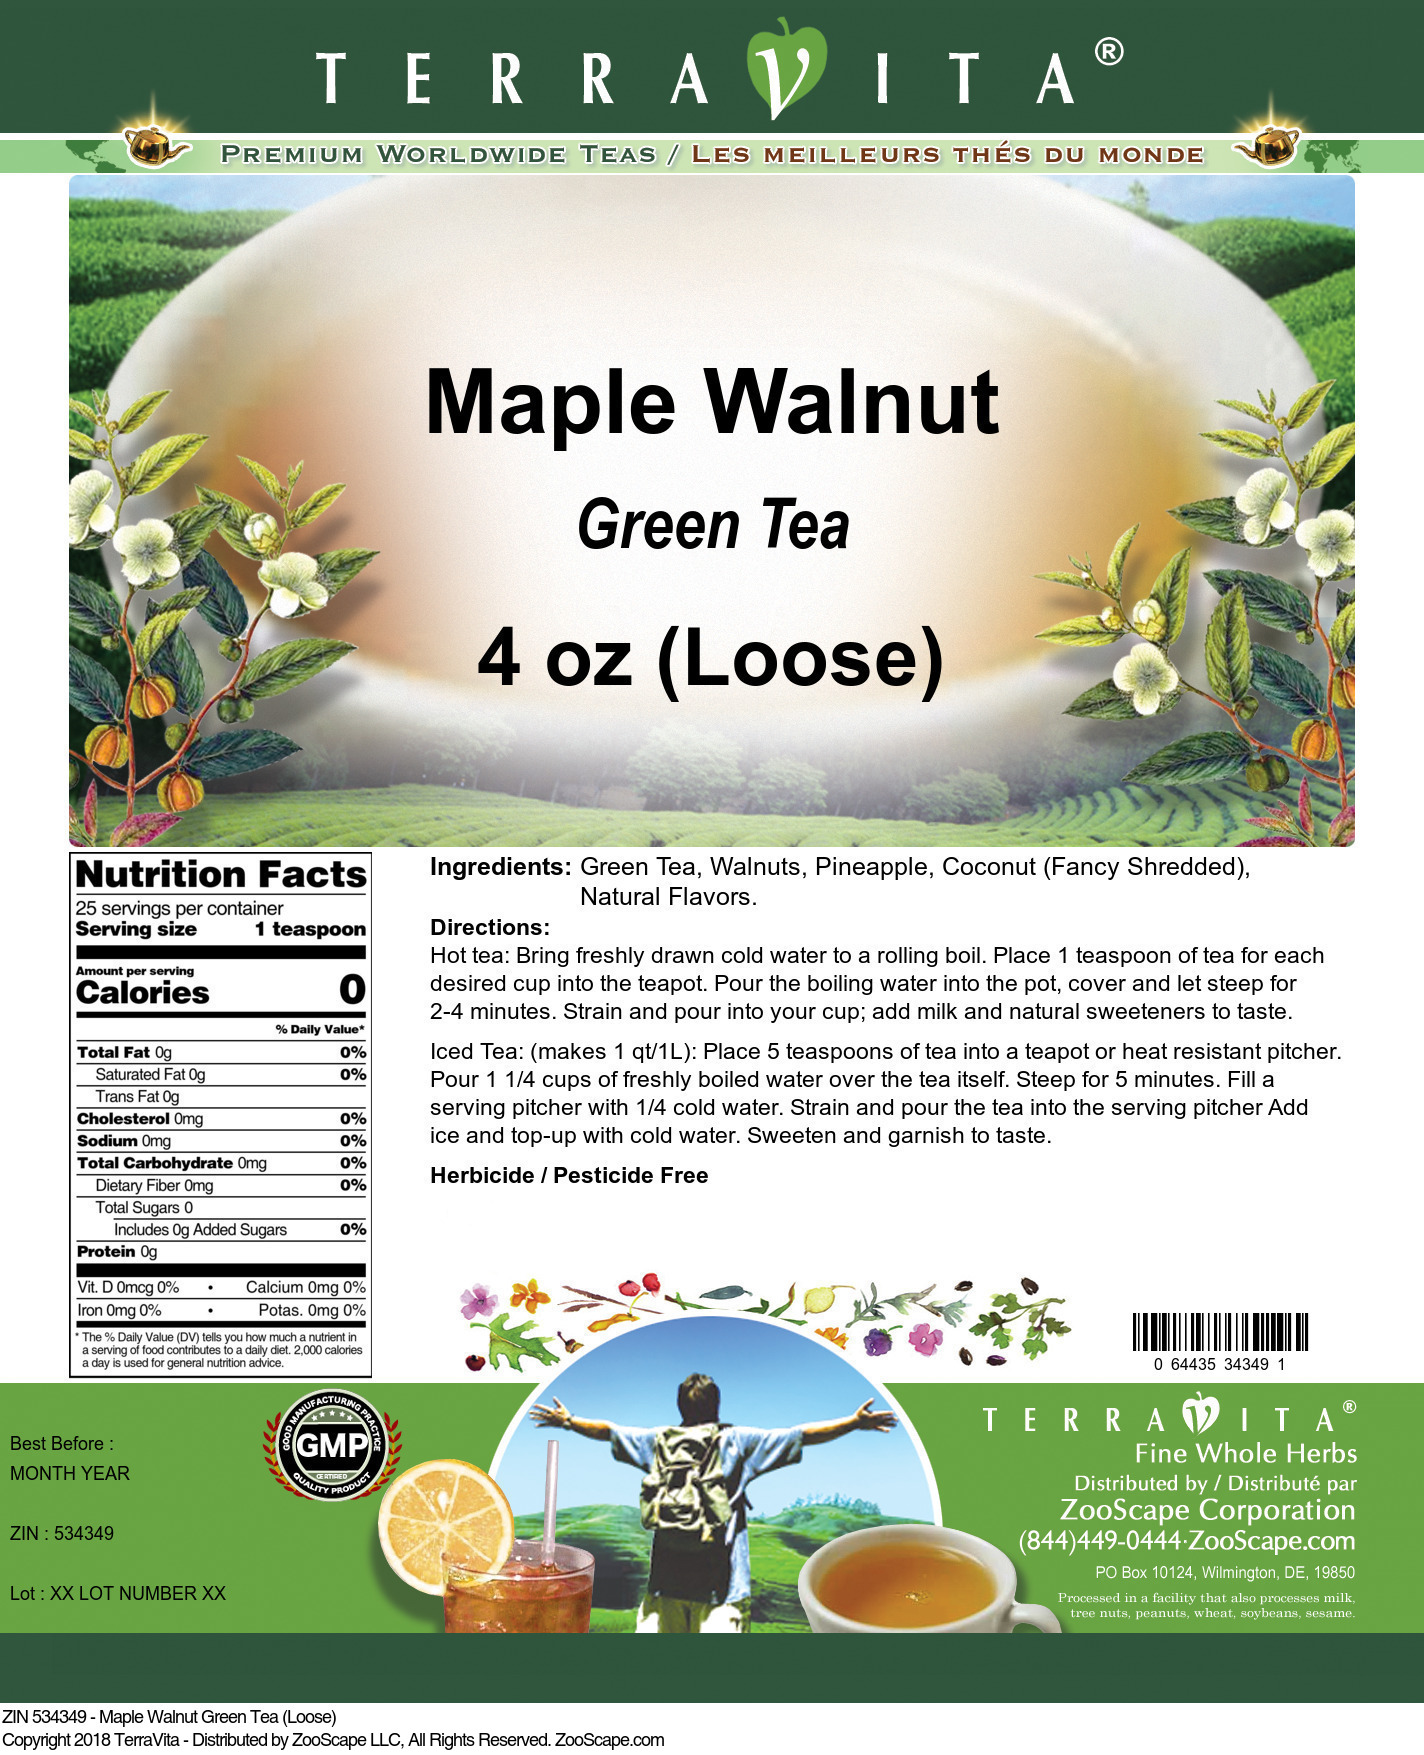 Maple Walnut Green Tea (Loose)